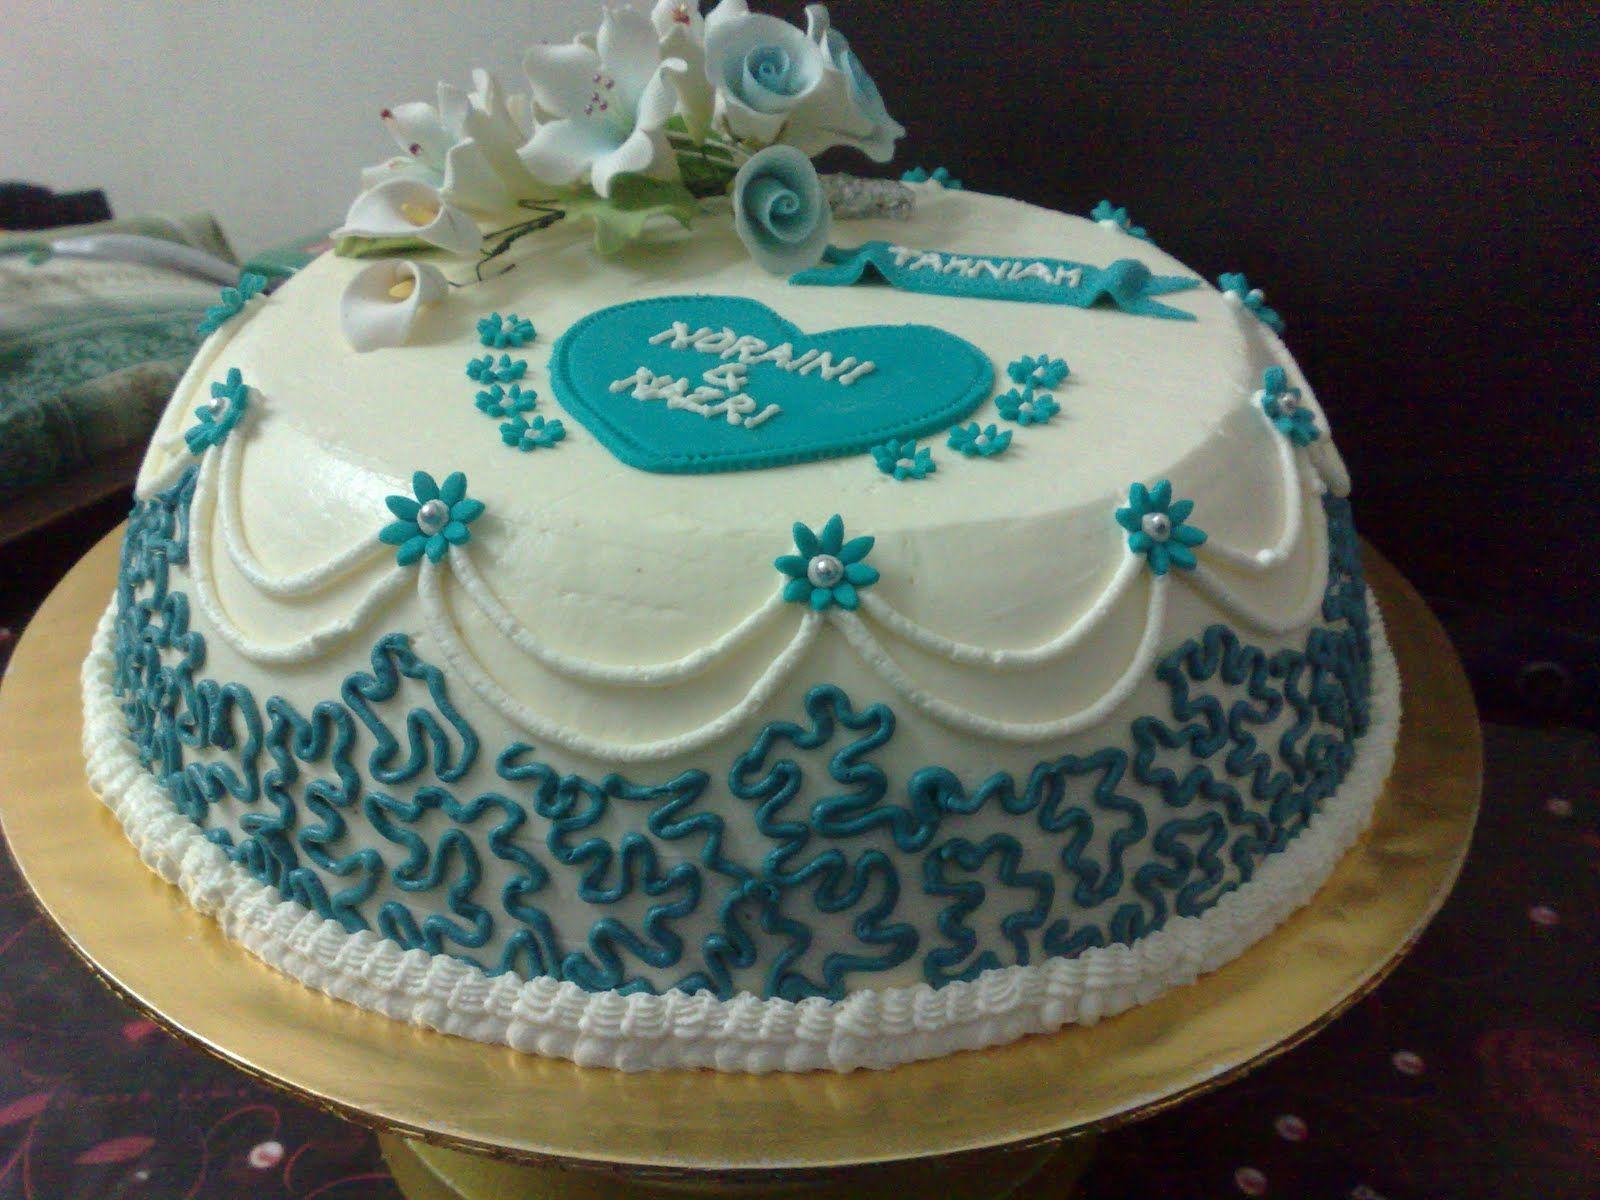 Peony Wedding Cake One Layer wedding cake for her niece